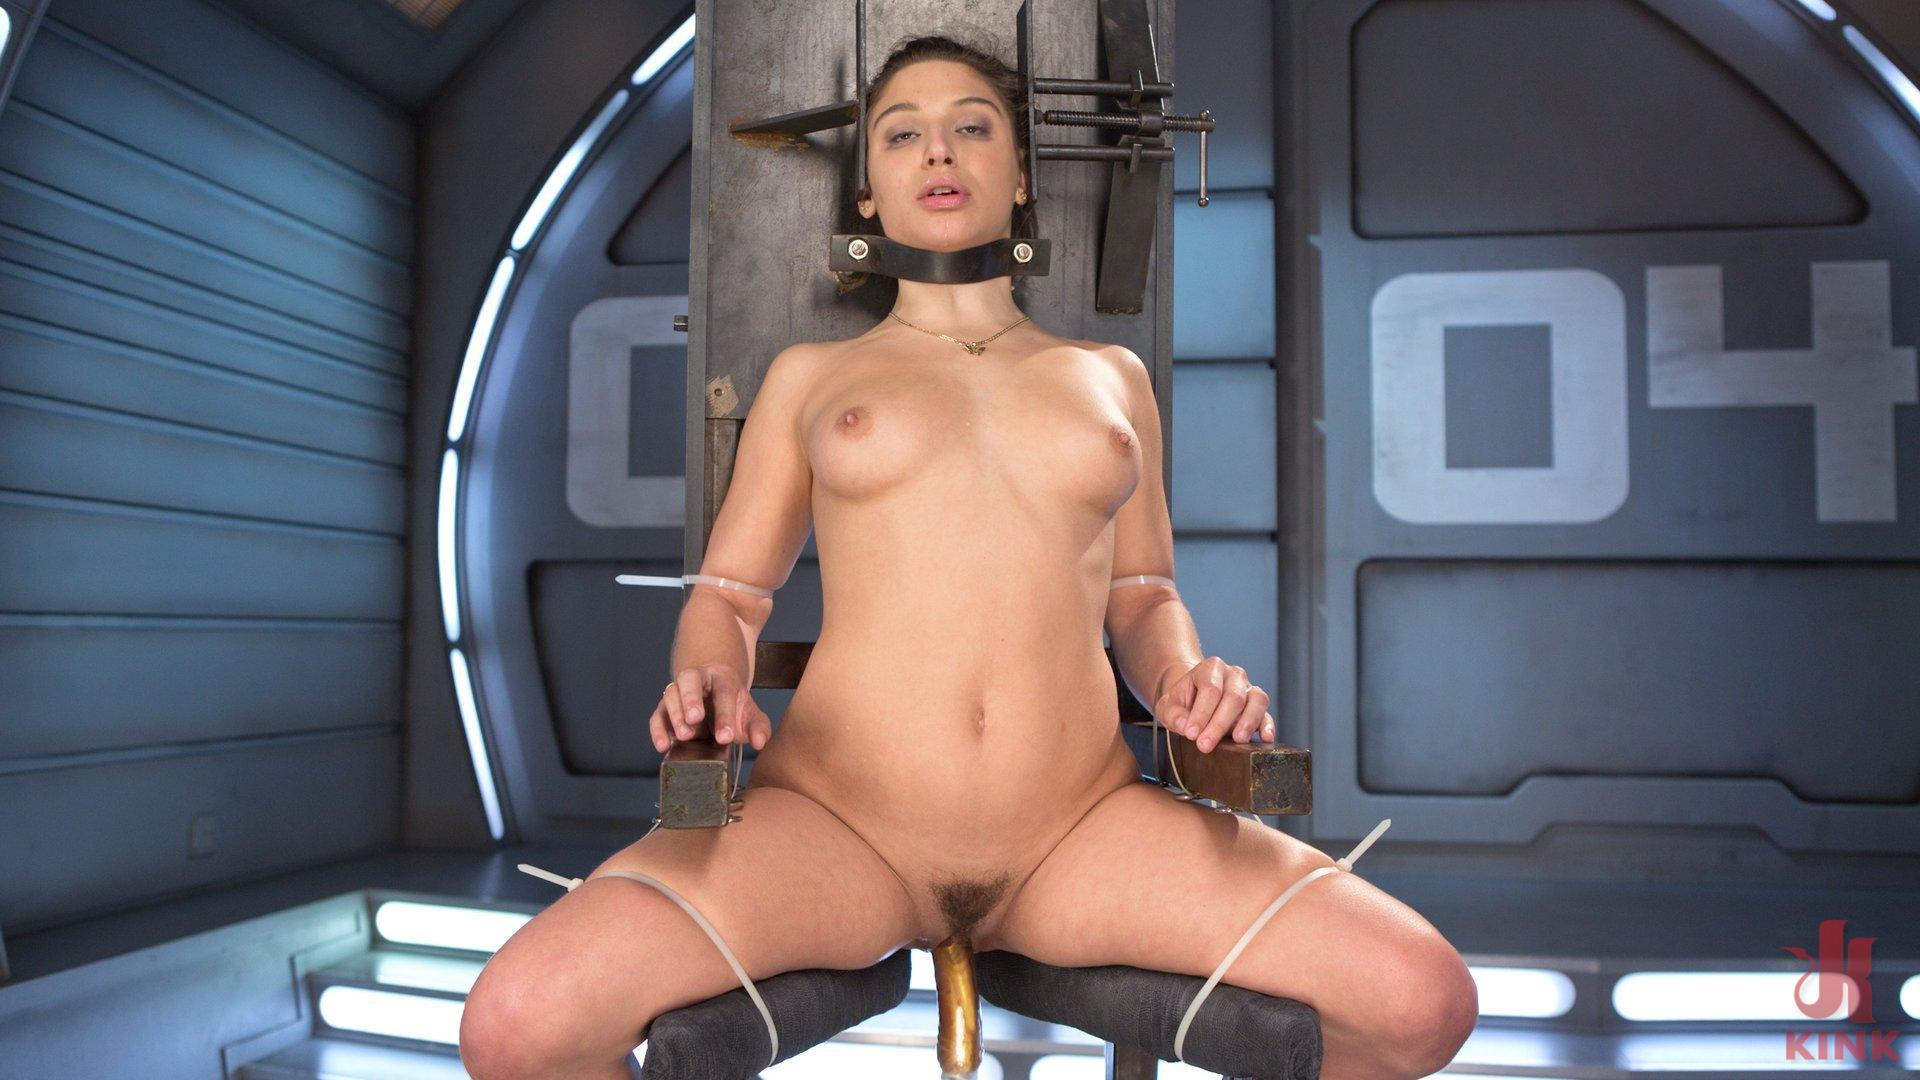 Photo number 10 from Bondage Slut Gets Fucked Senseless in Rope Bondage shot for Fucking Machines on Kink.com. Featuring Abella Danger in hardcore BDSM & Fetish porn.